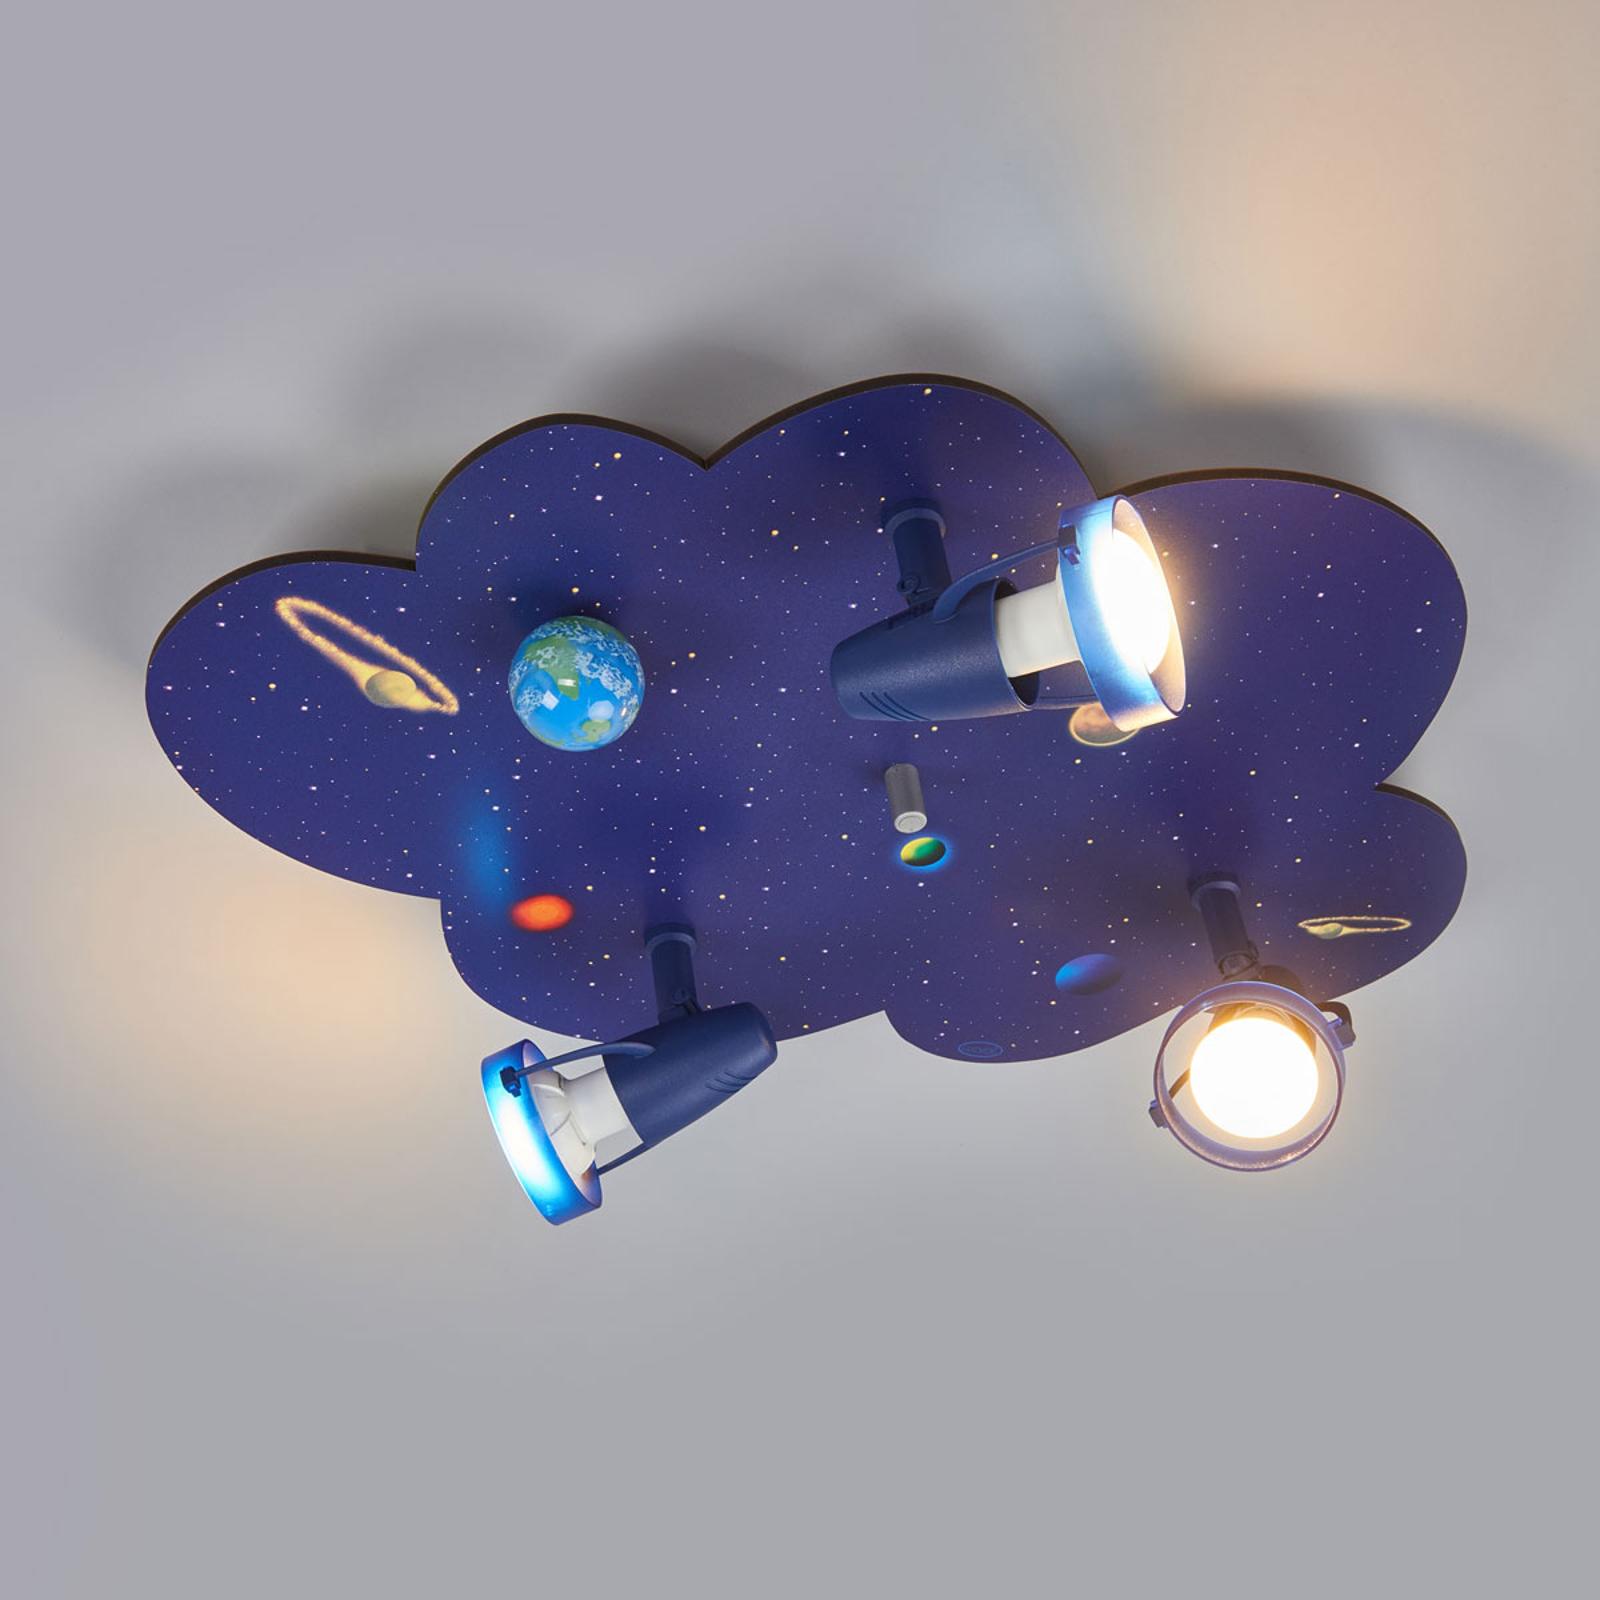 Wolkenvormige plafondlamp WELTALL